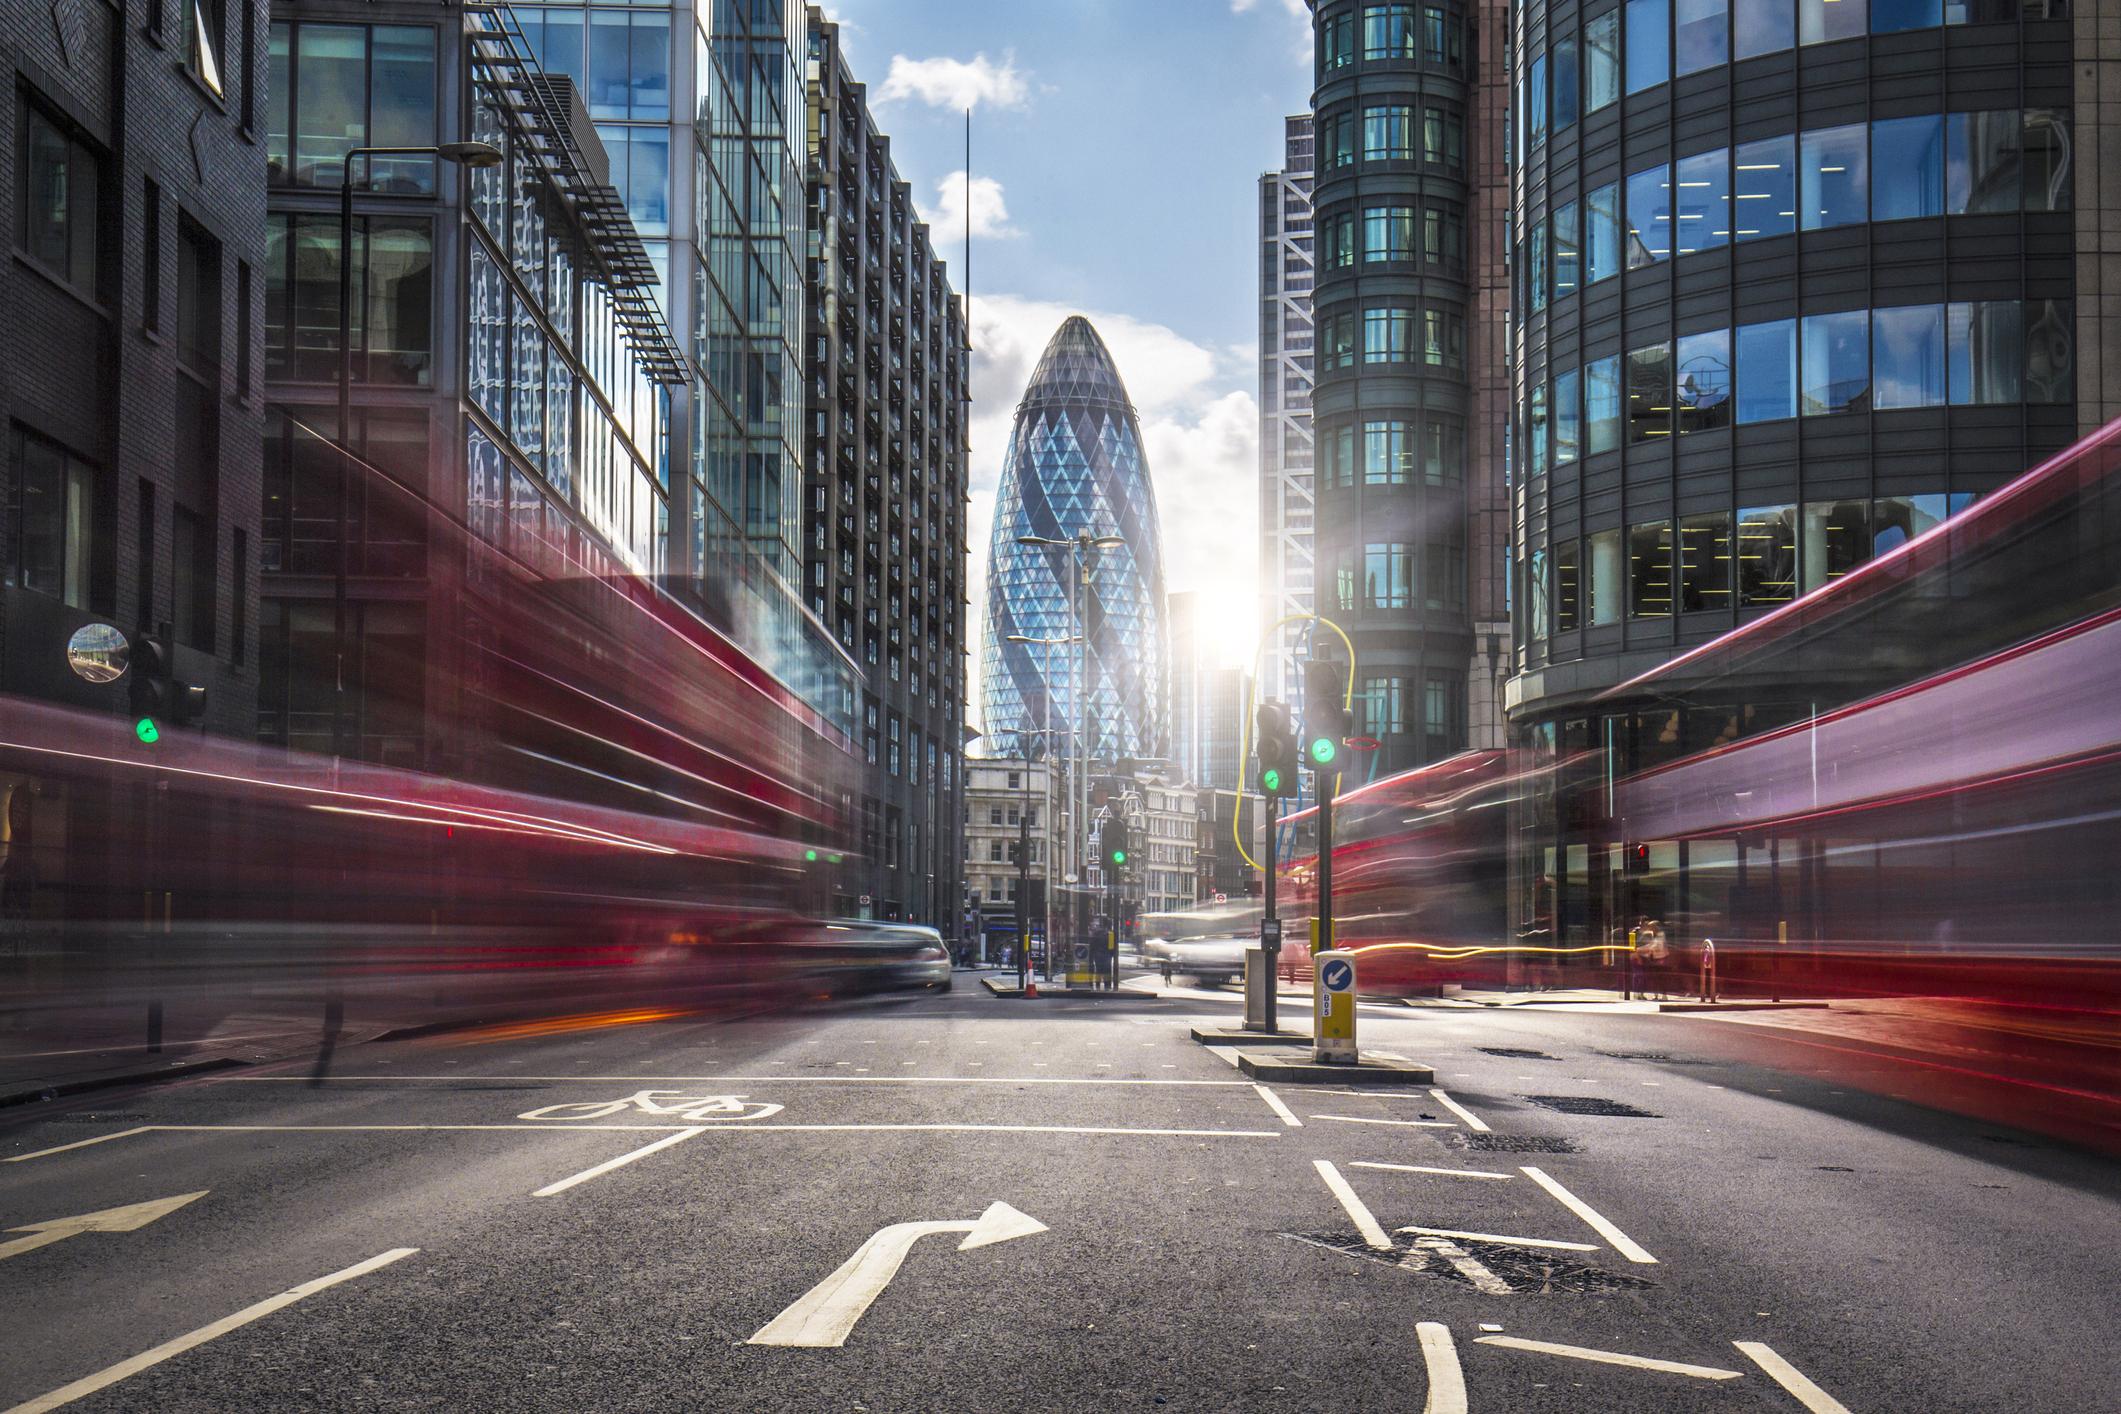 techcrunch.com - Natasha Lomas - London's transport regulator looks to startups to help fix urban mobility